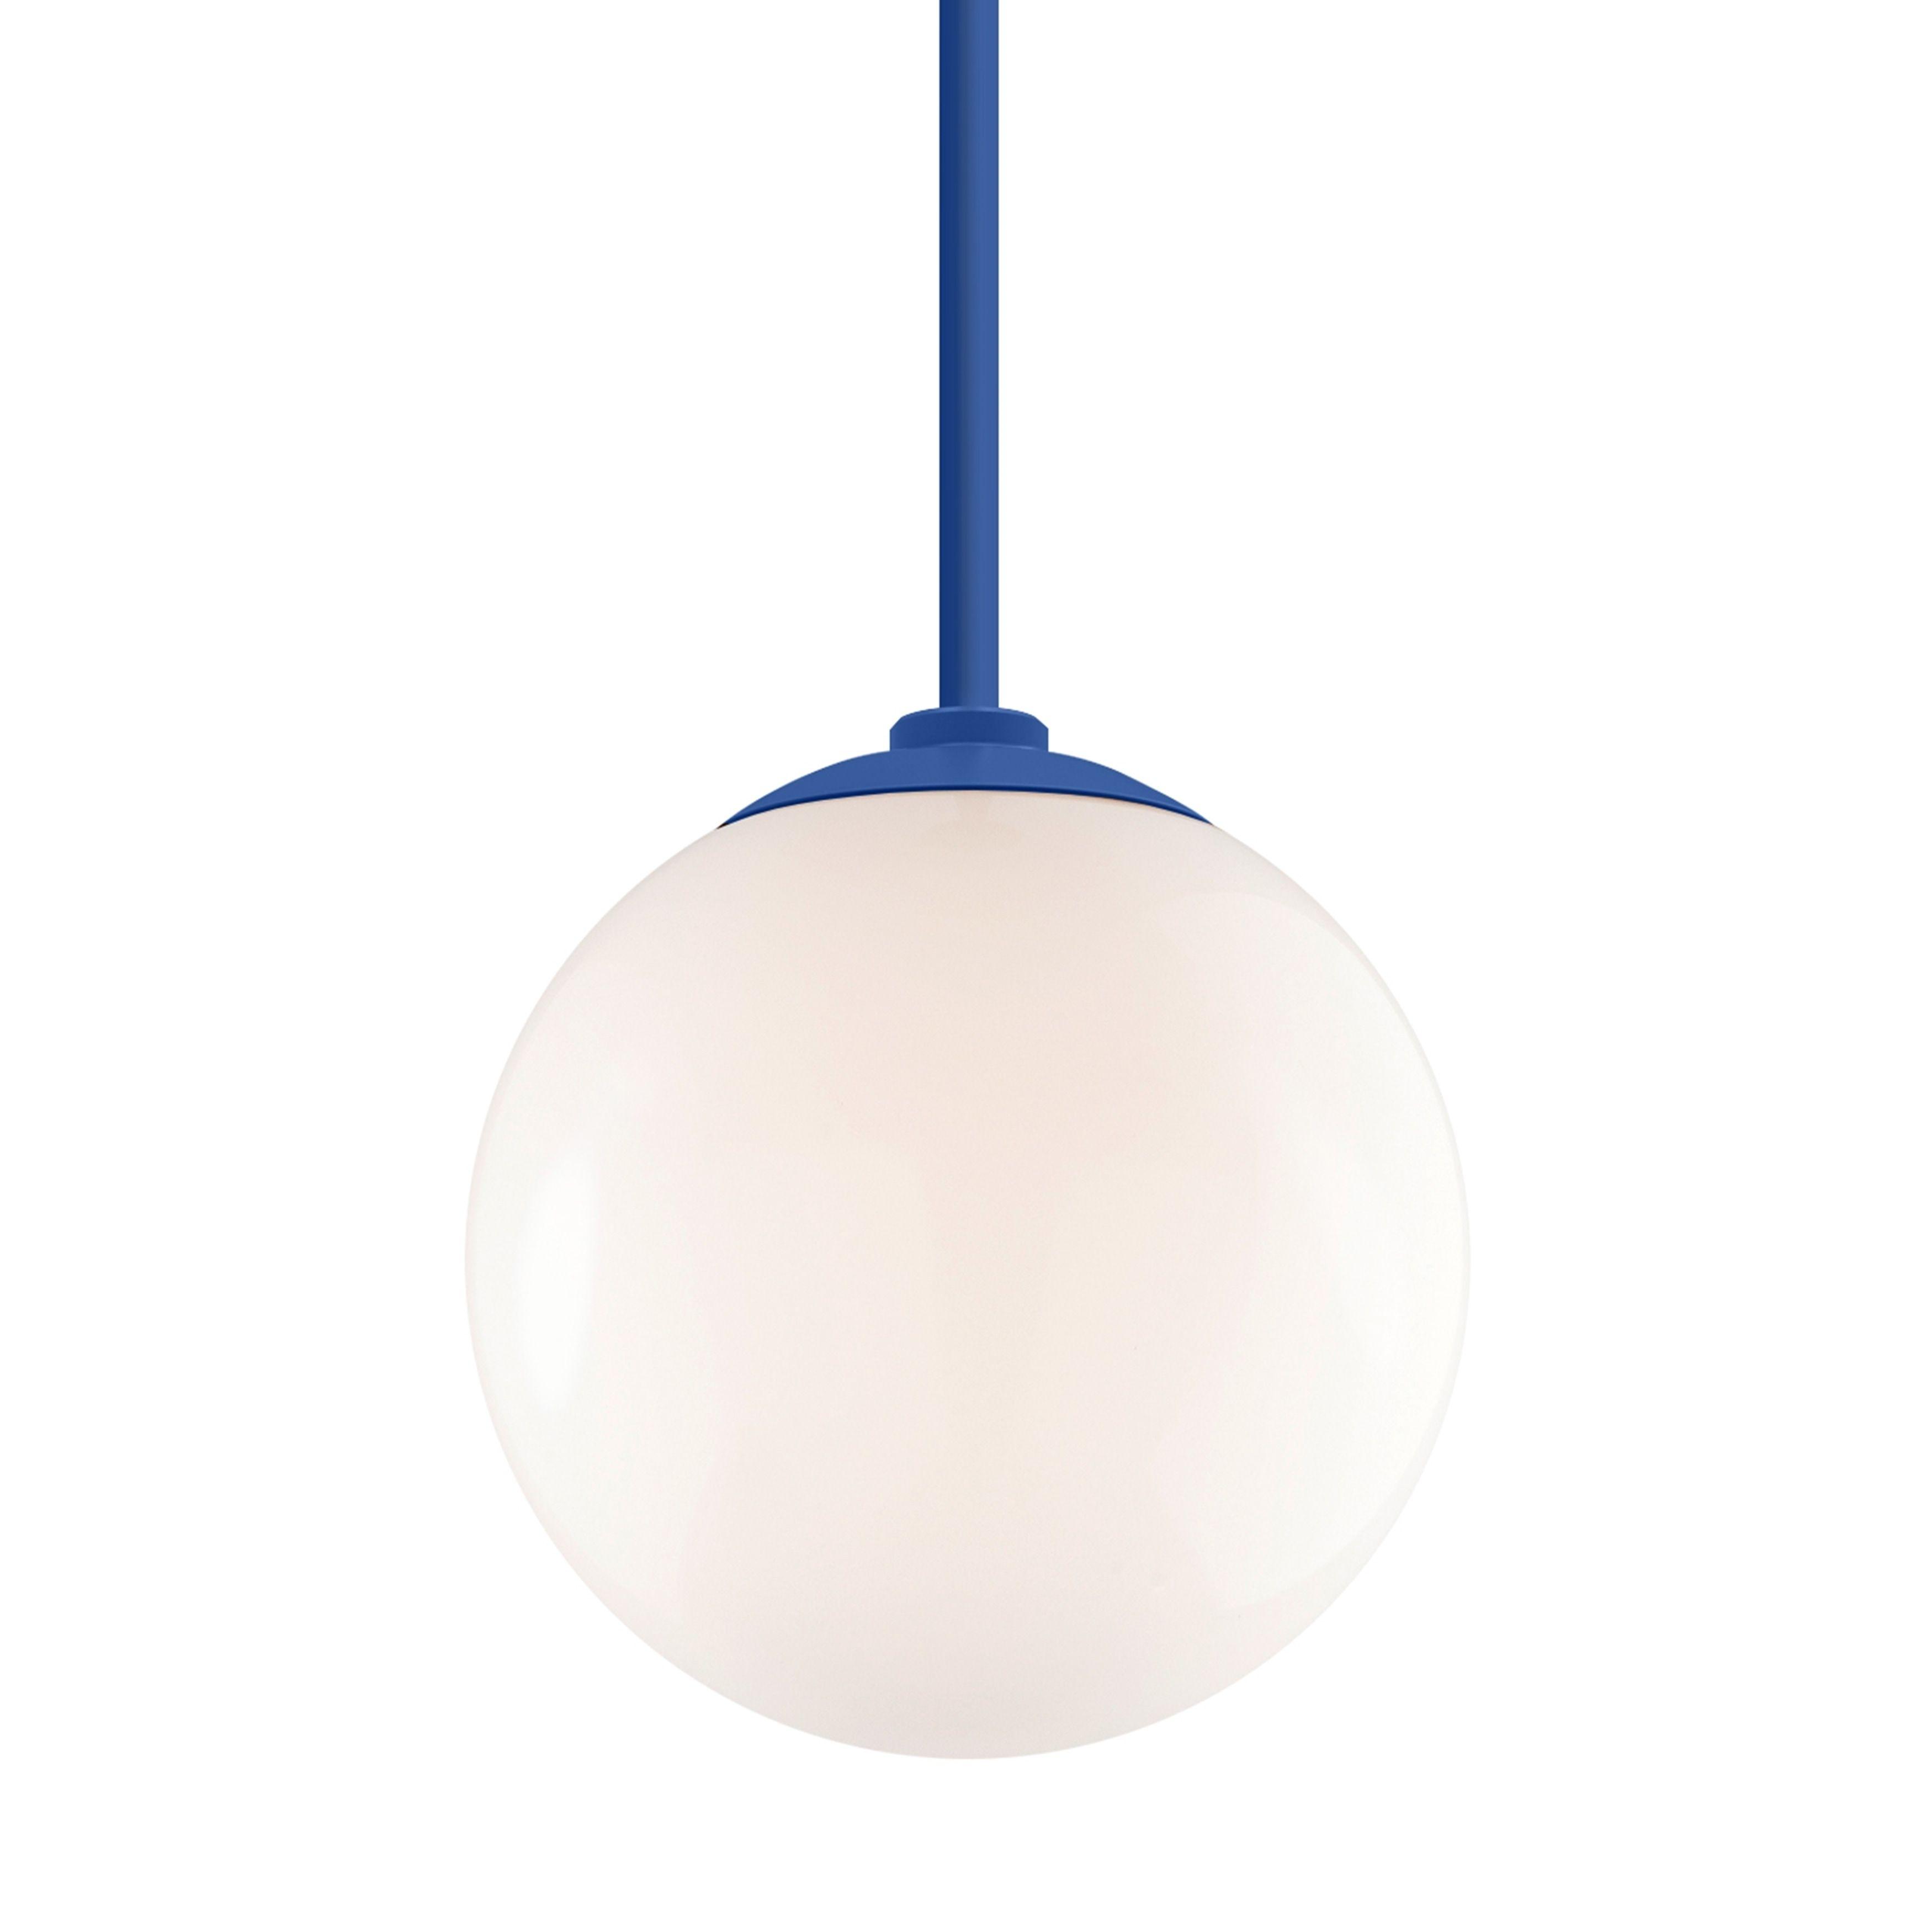 Troy Rlm Lighting Globe Blue 24 Inch Stem Pendant White 12 Inch